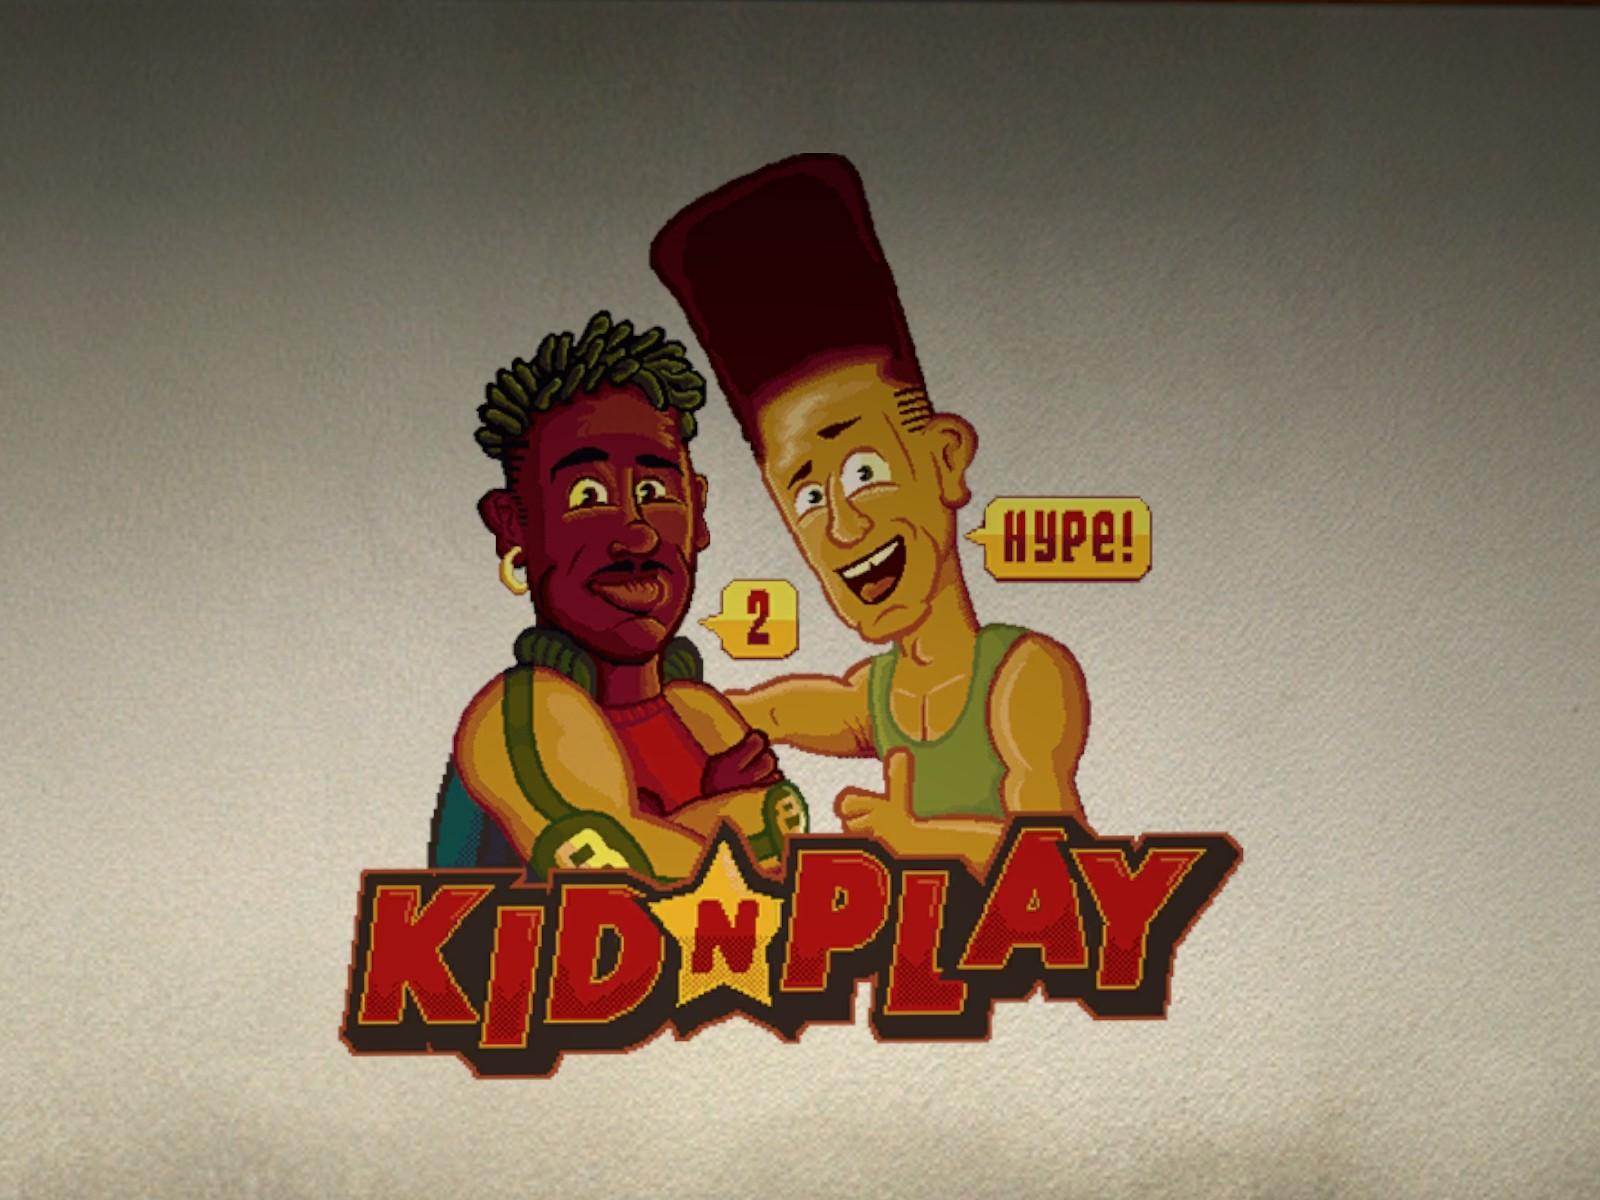 8 Bit Kid N Play Counter Strike Source Sprays